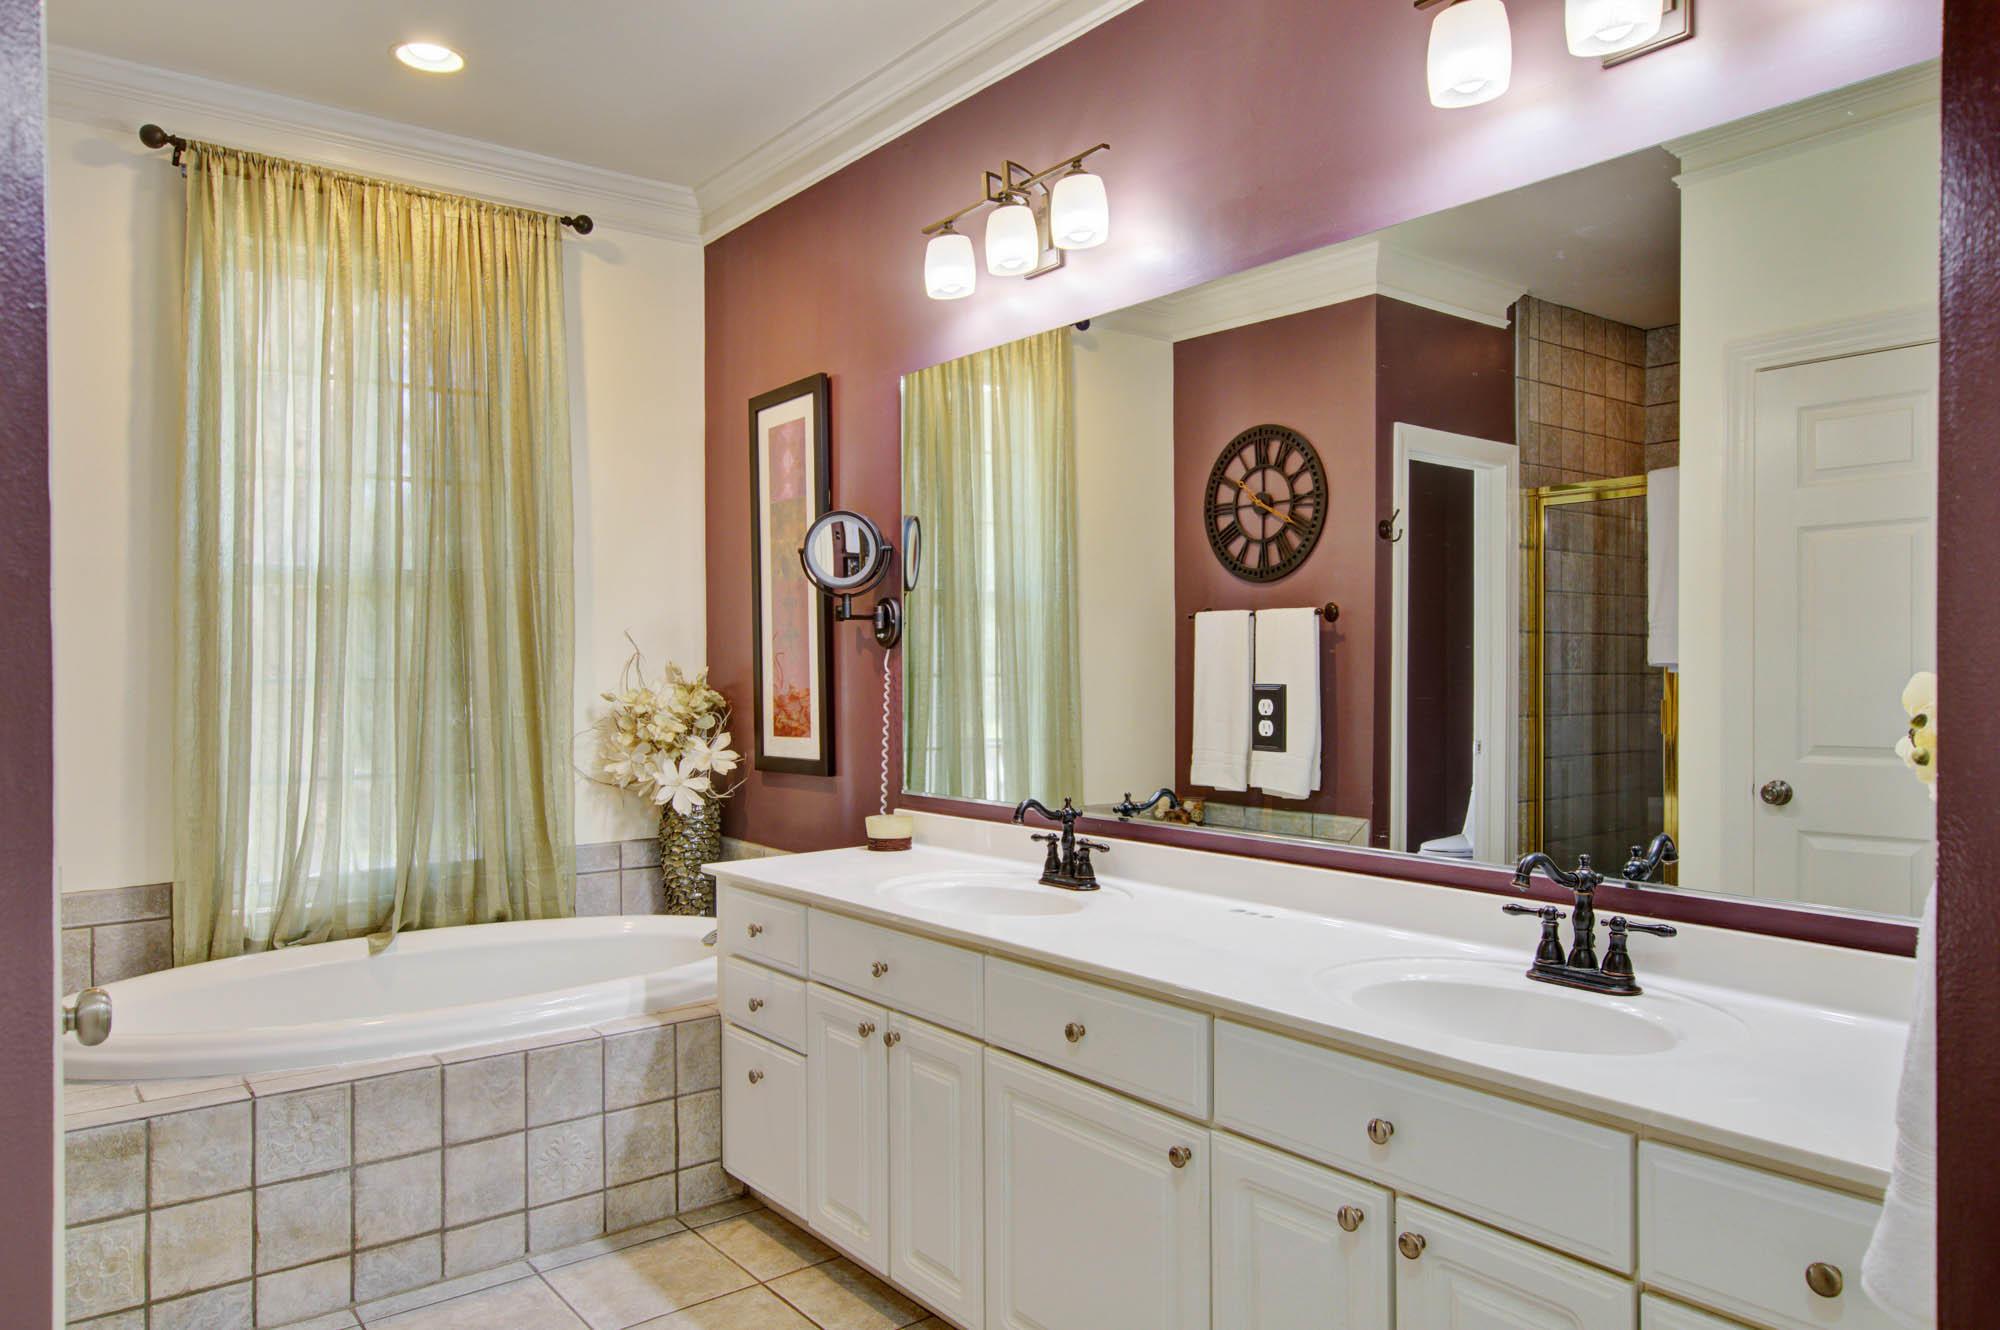 St Thomas Point Homes For Sale - 307 Jamesbury, Charleston, SC - 21